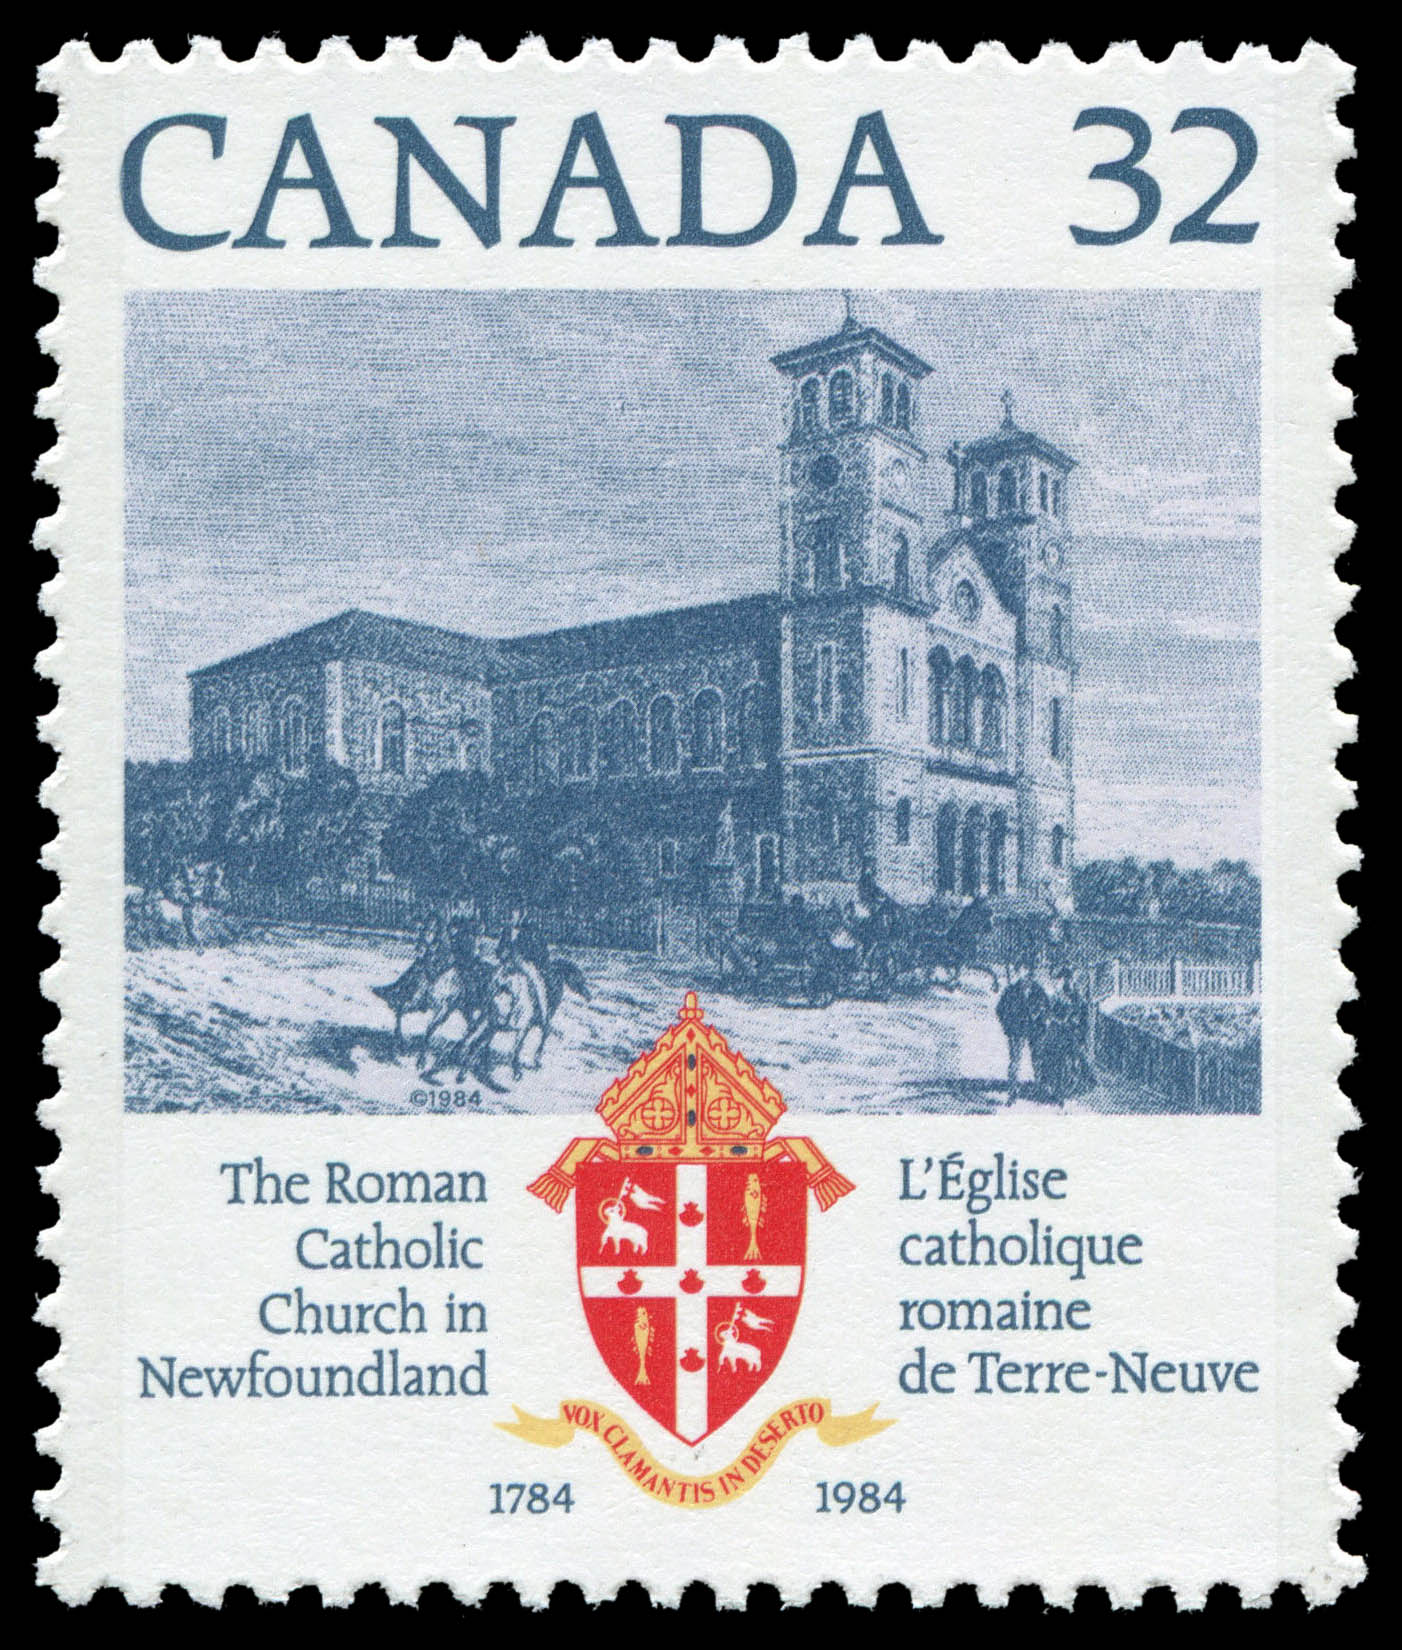 The Roman Catholic Church in Newfoundland, 1784-1984 Canada Postage Stamp